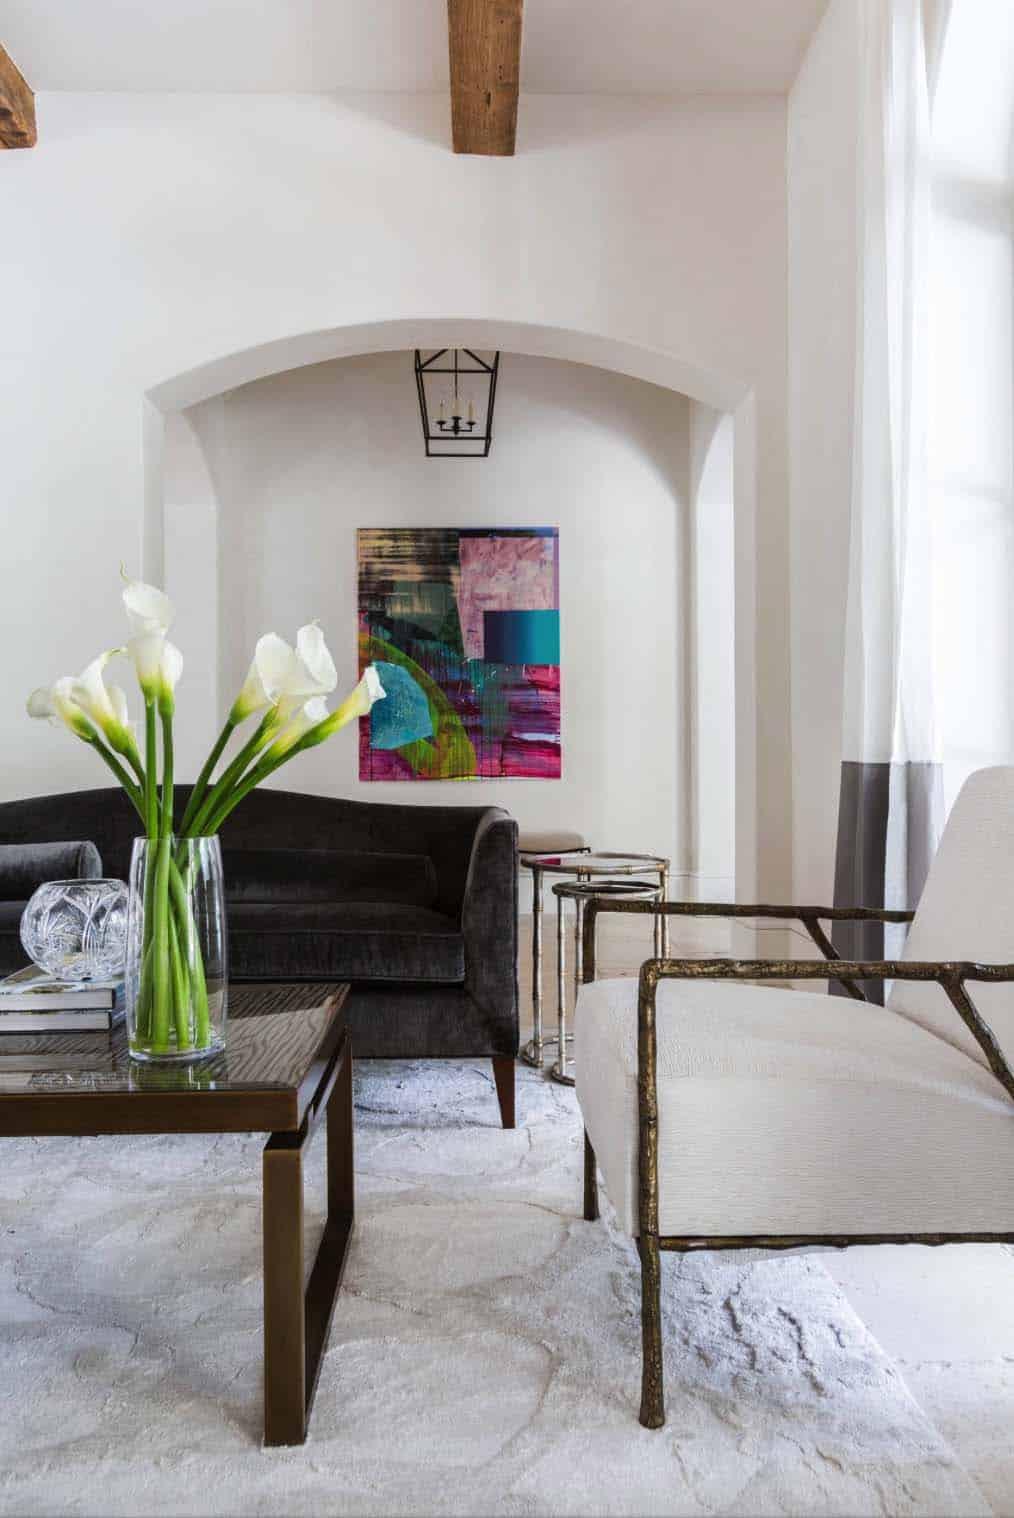 Maison de style méditerranéen-Marie Flanigan Interiors-10-1 Kindesign